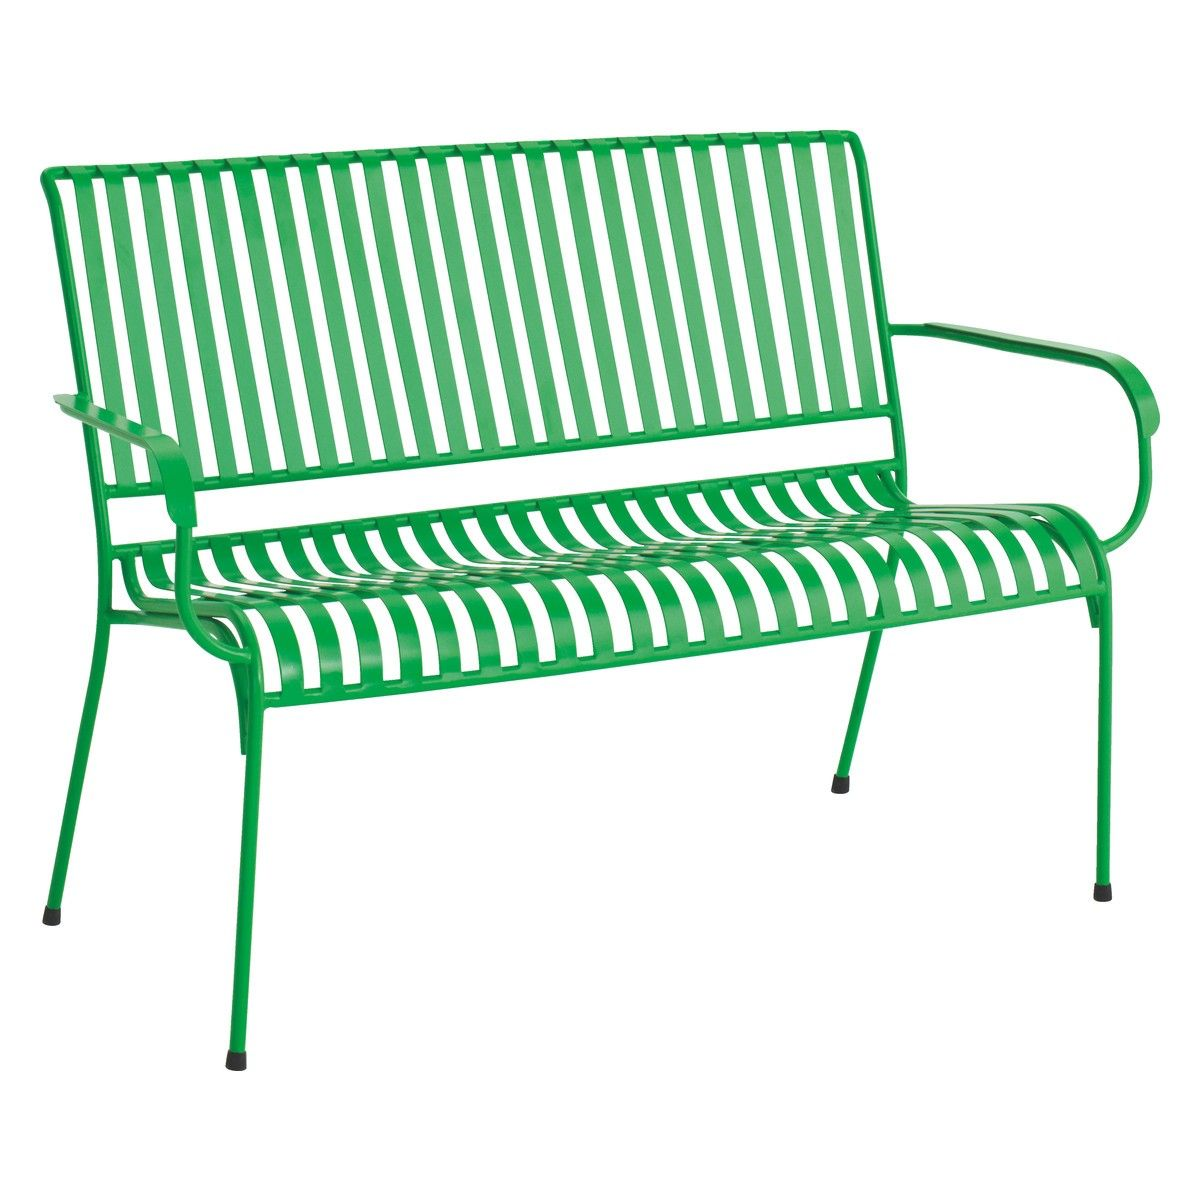 Indu Green Metal Garden Bench Metal Garden Benches Garden Seat